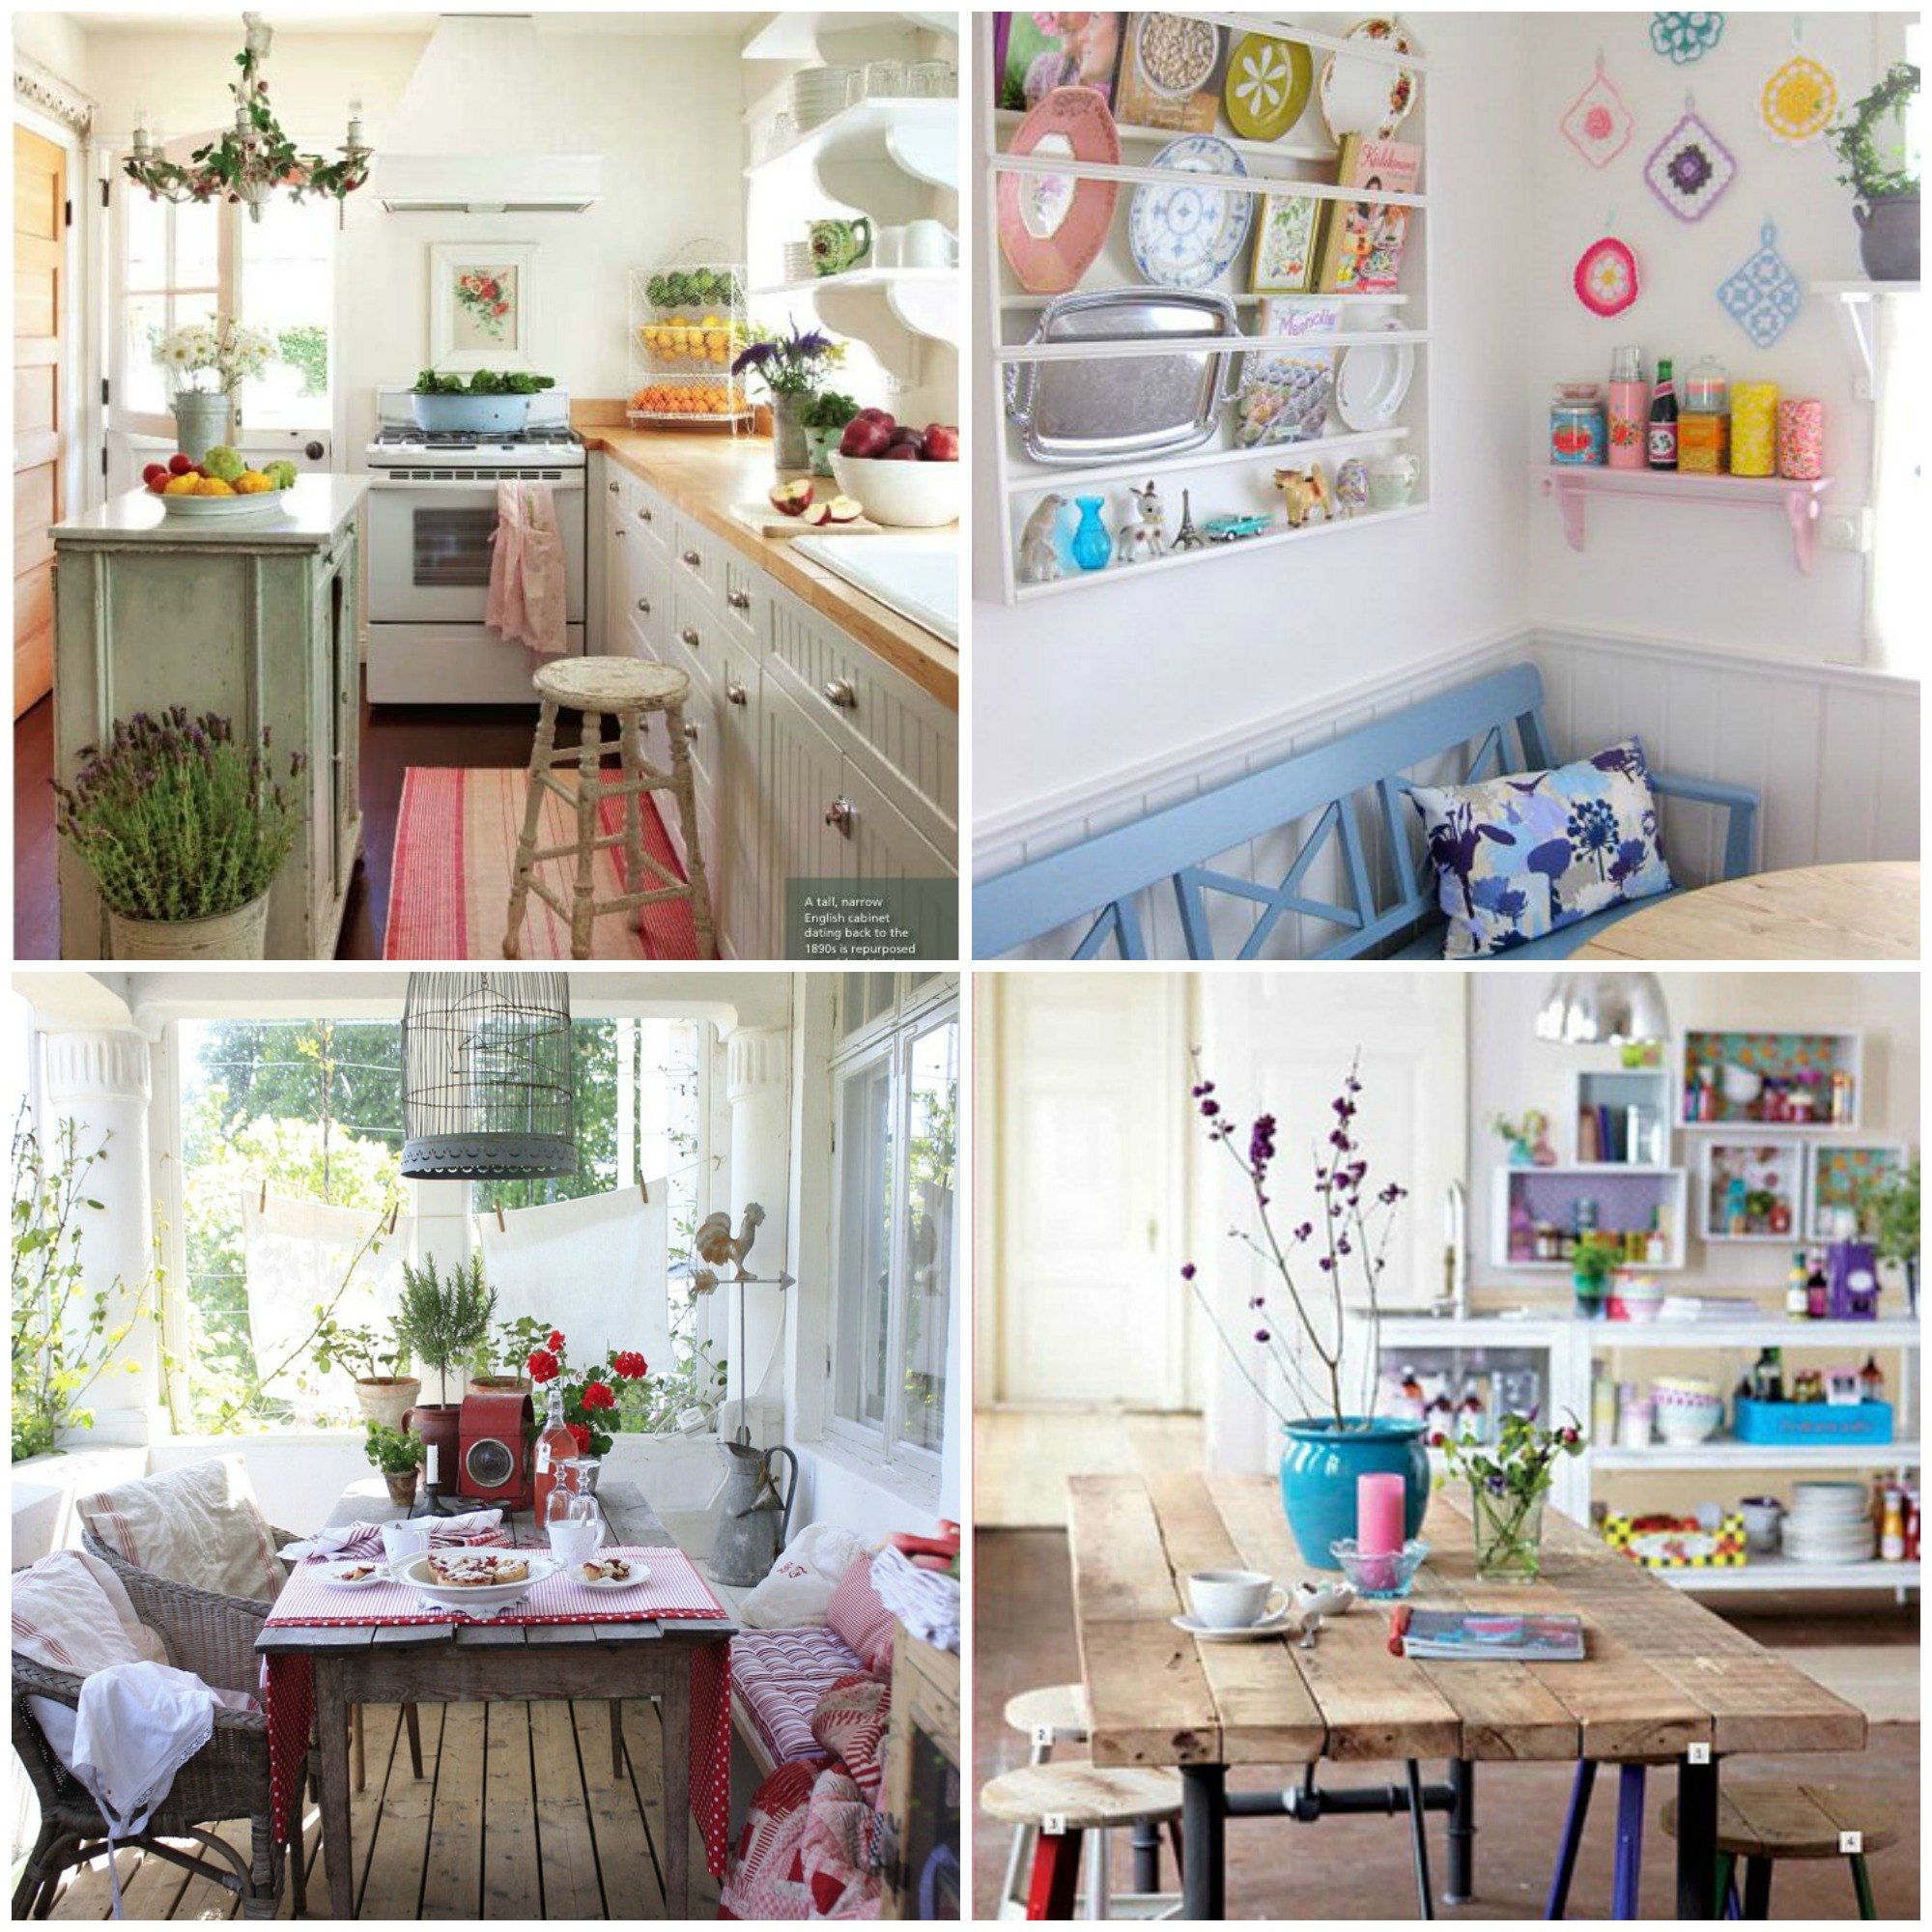 Stunning Idee Per Rinnovare La Cucina Ideas - Ideas & Design 2017 ...